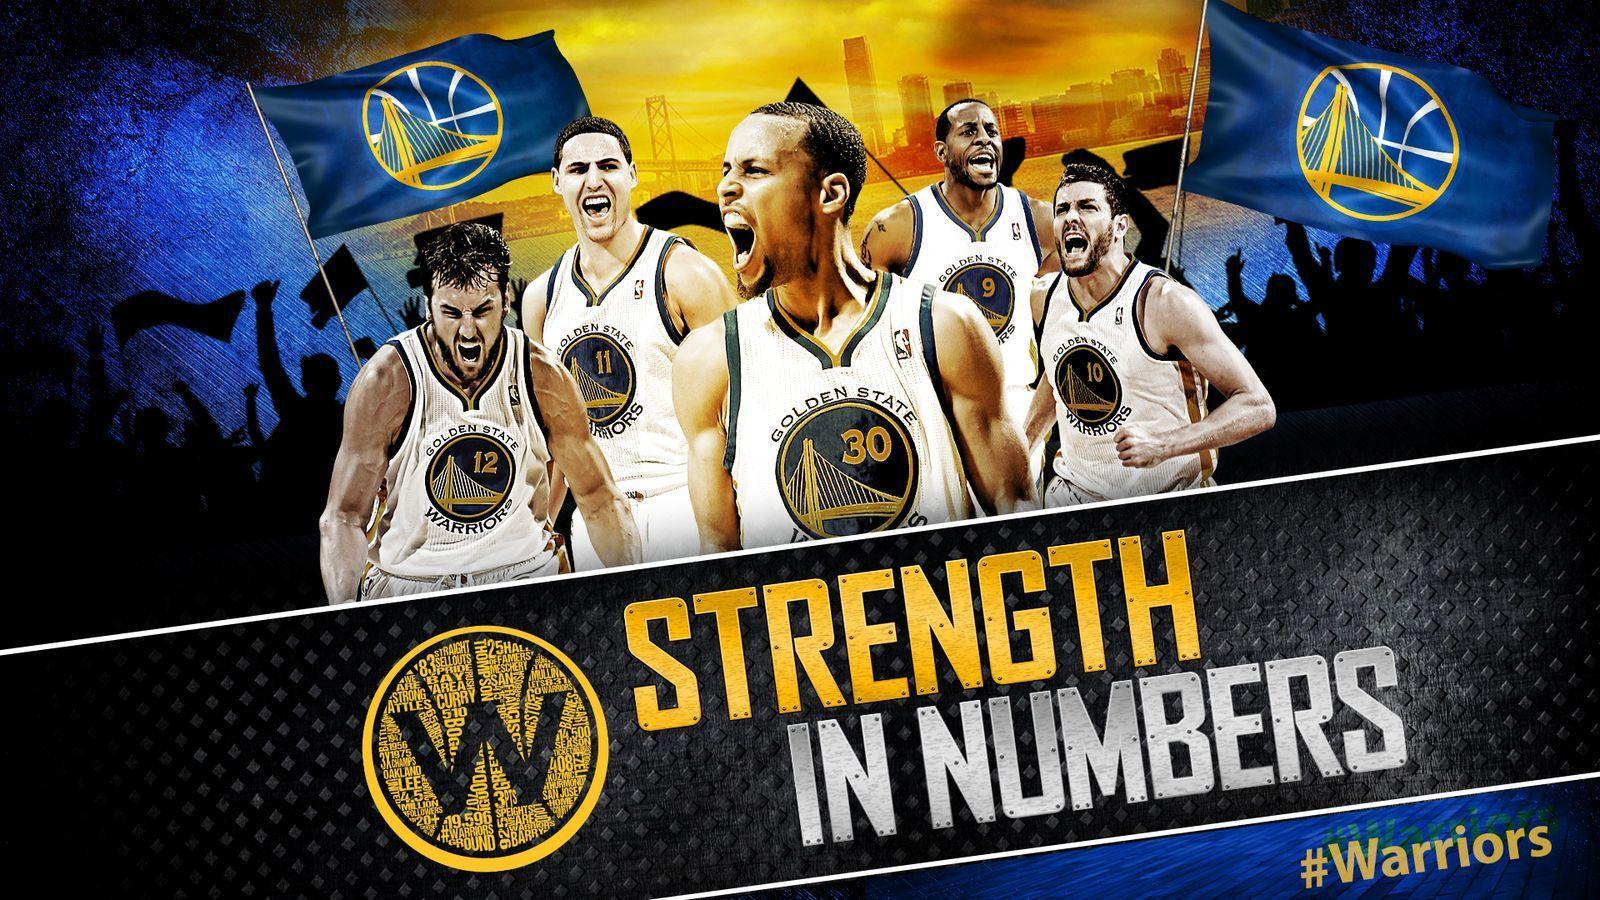 Warriors Team Wallpapers - Top Free